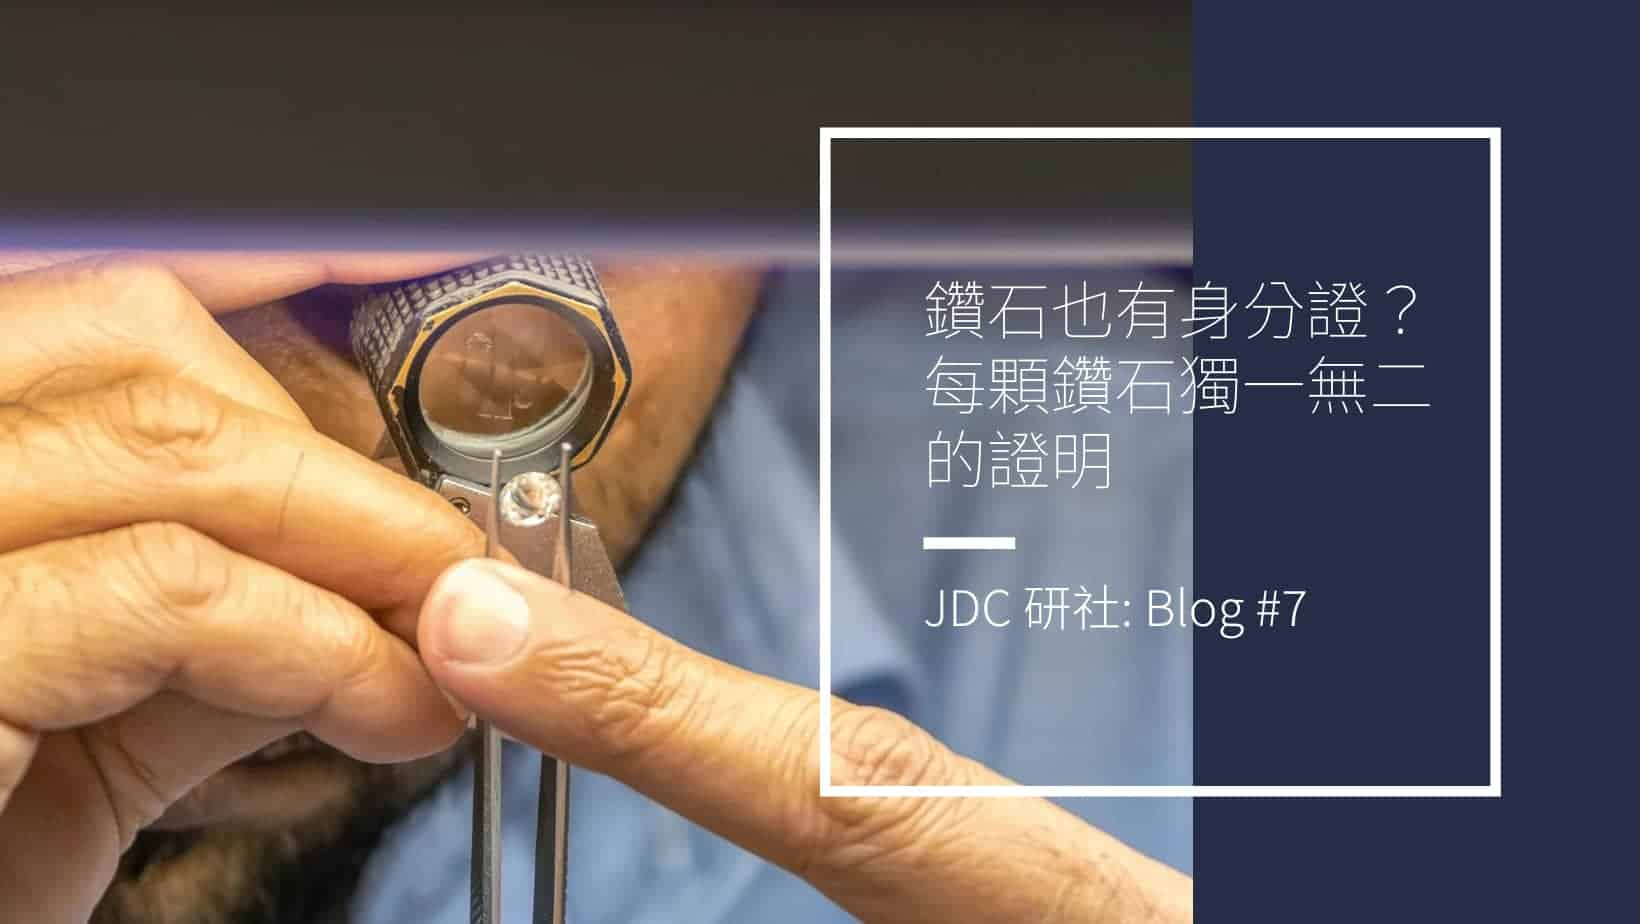 JDC Blog#7